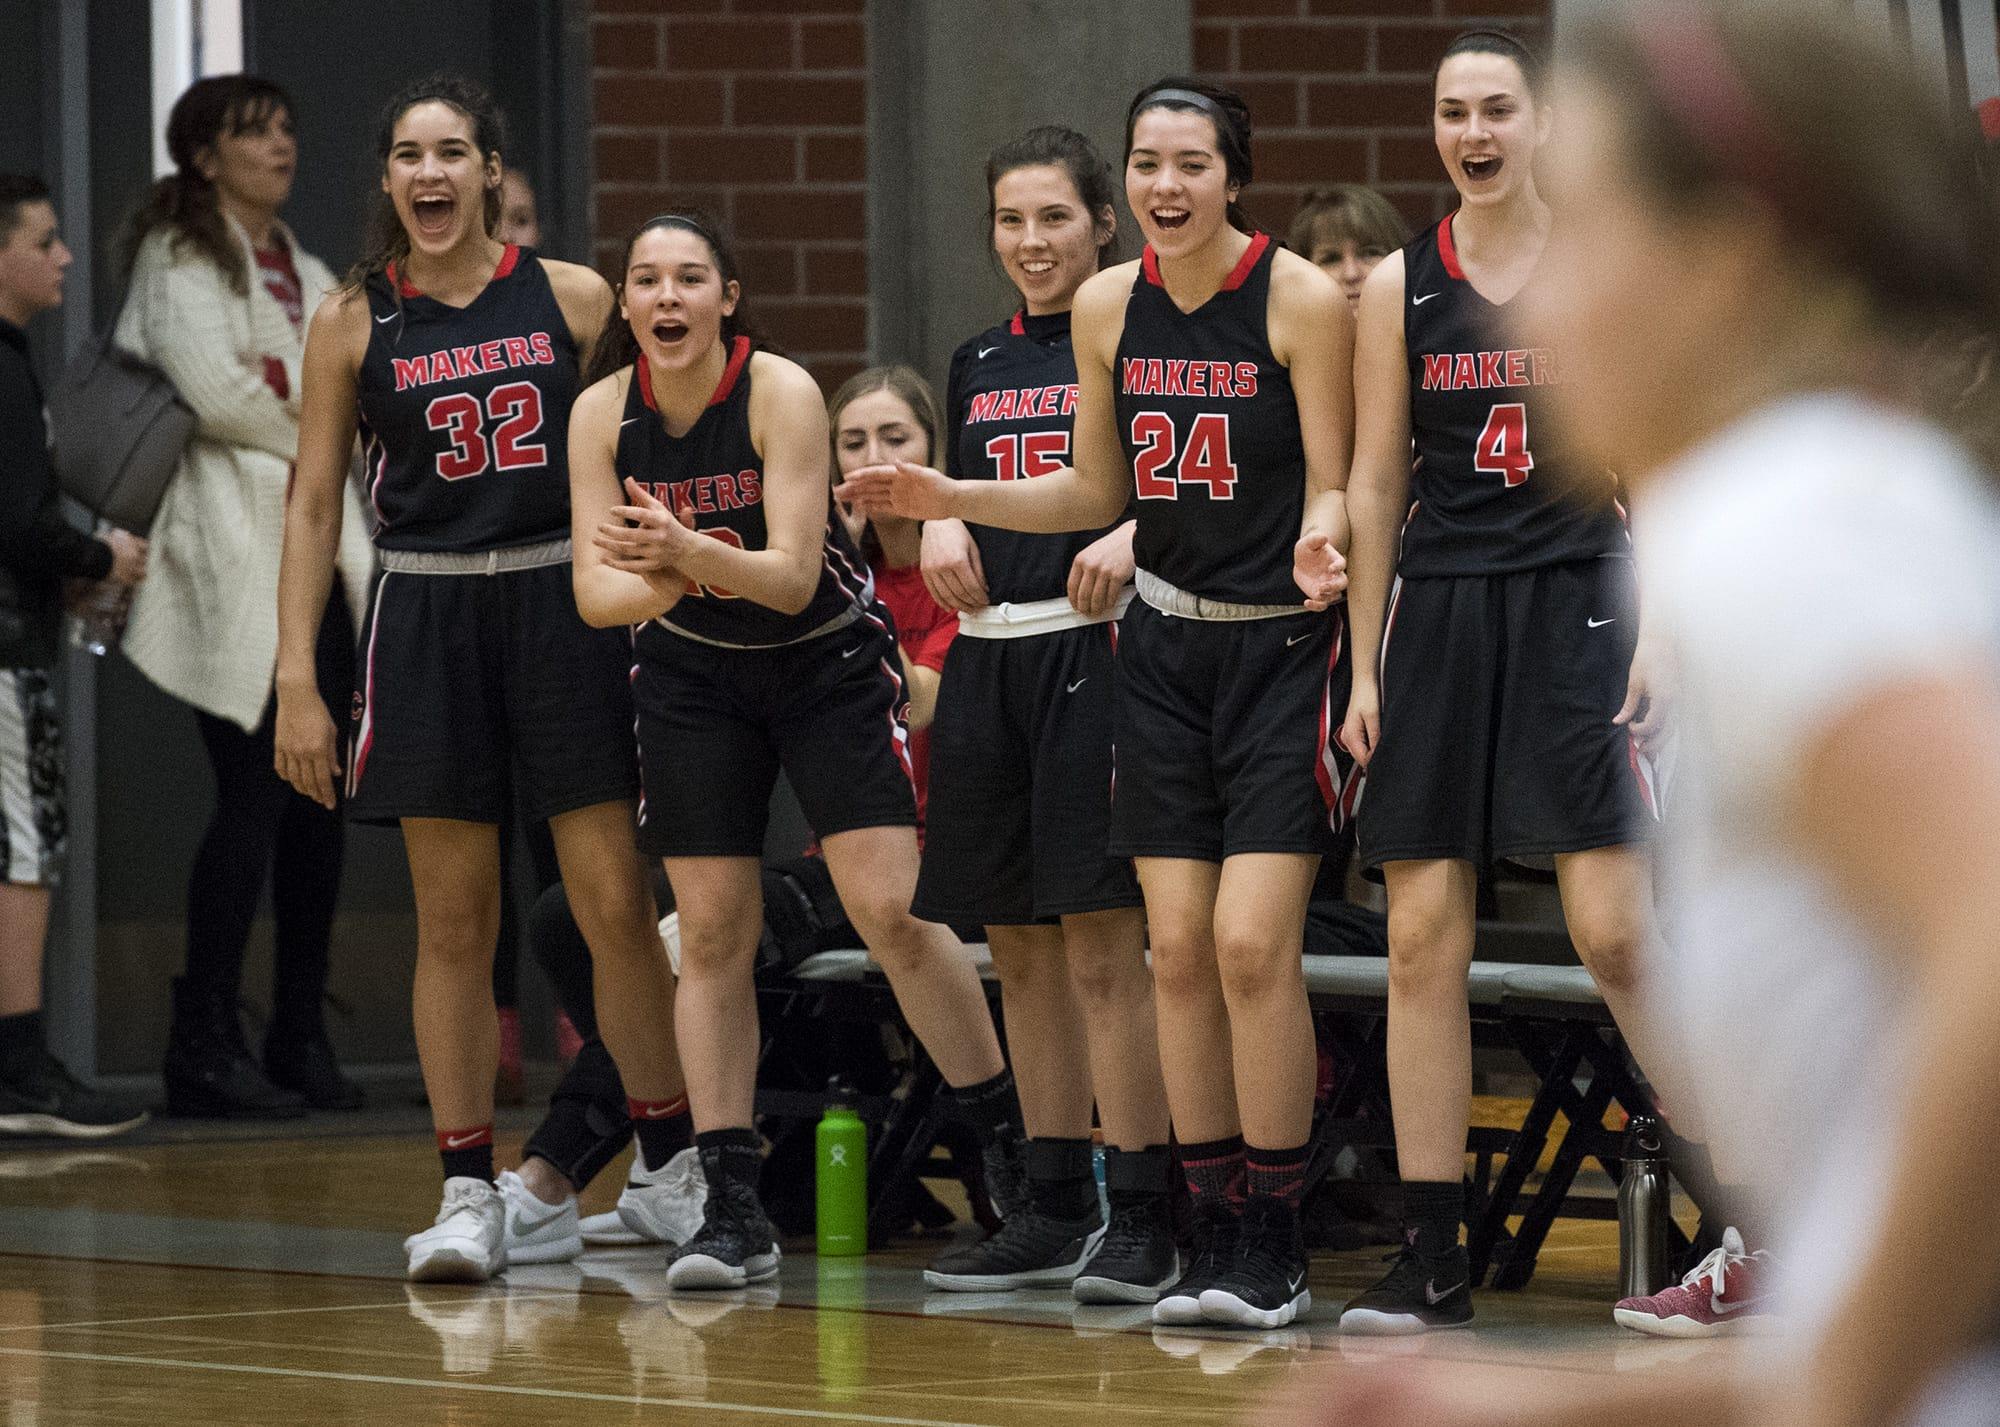 Union Vs Camas Girls Basketball - Columbiancom-3421